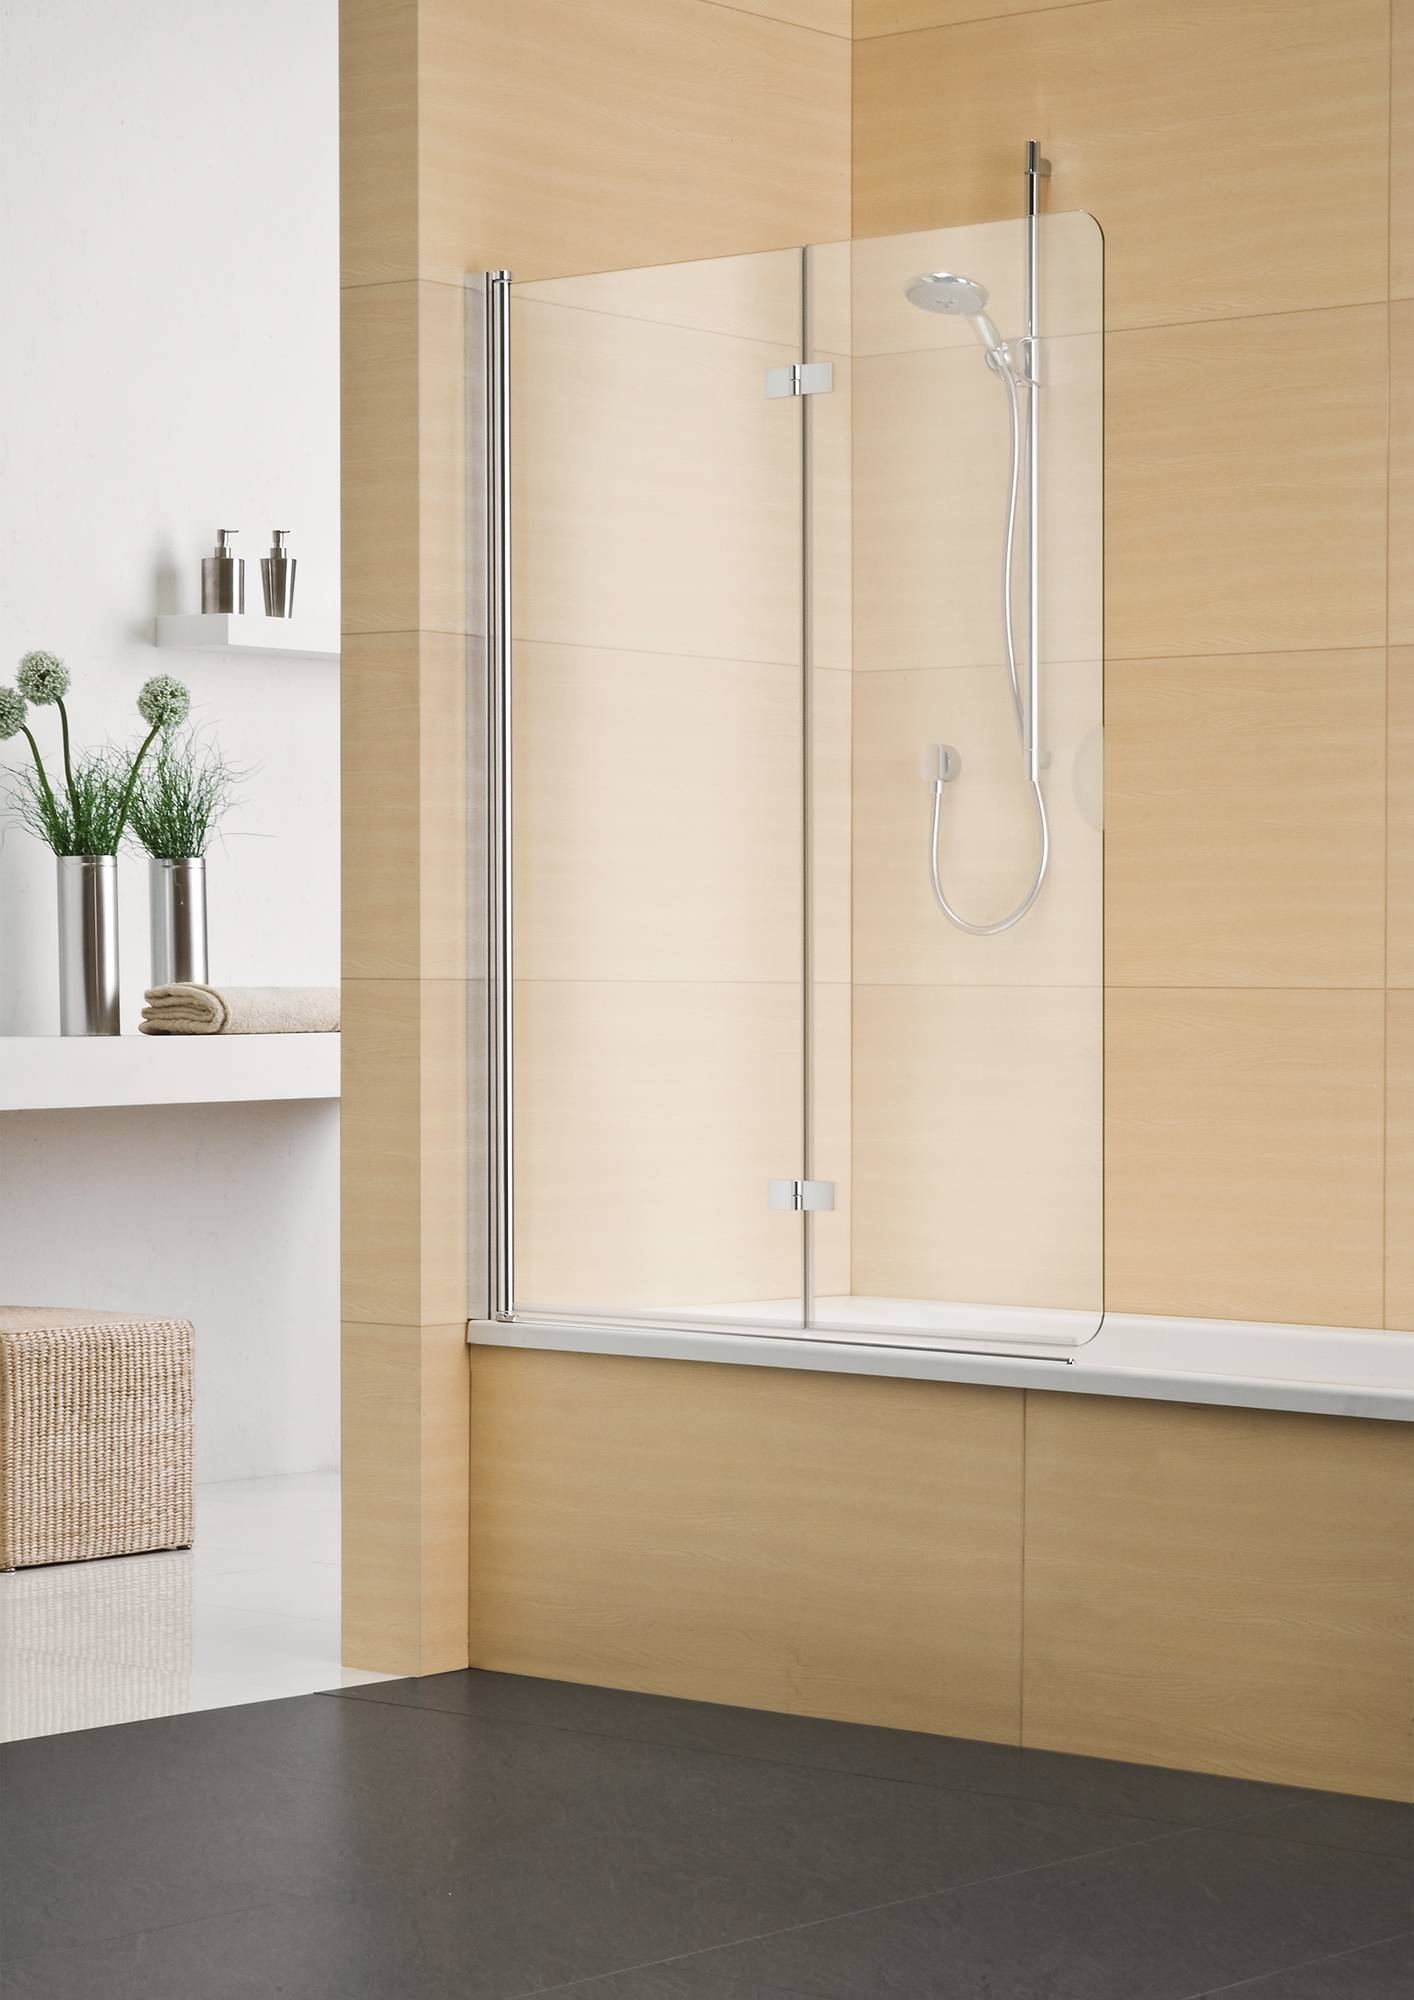 Sealskin Duka Multi vouw-pendel badwand 2-dlg R.vast 140(B)x150(H) cm mat zilver helder glas